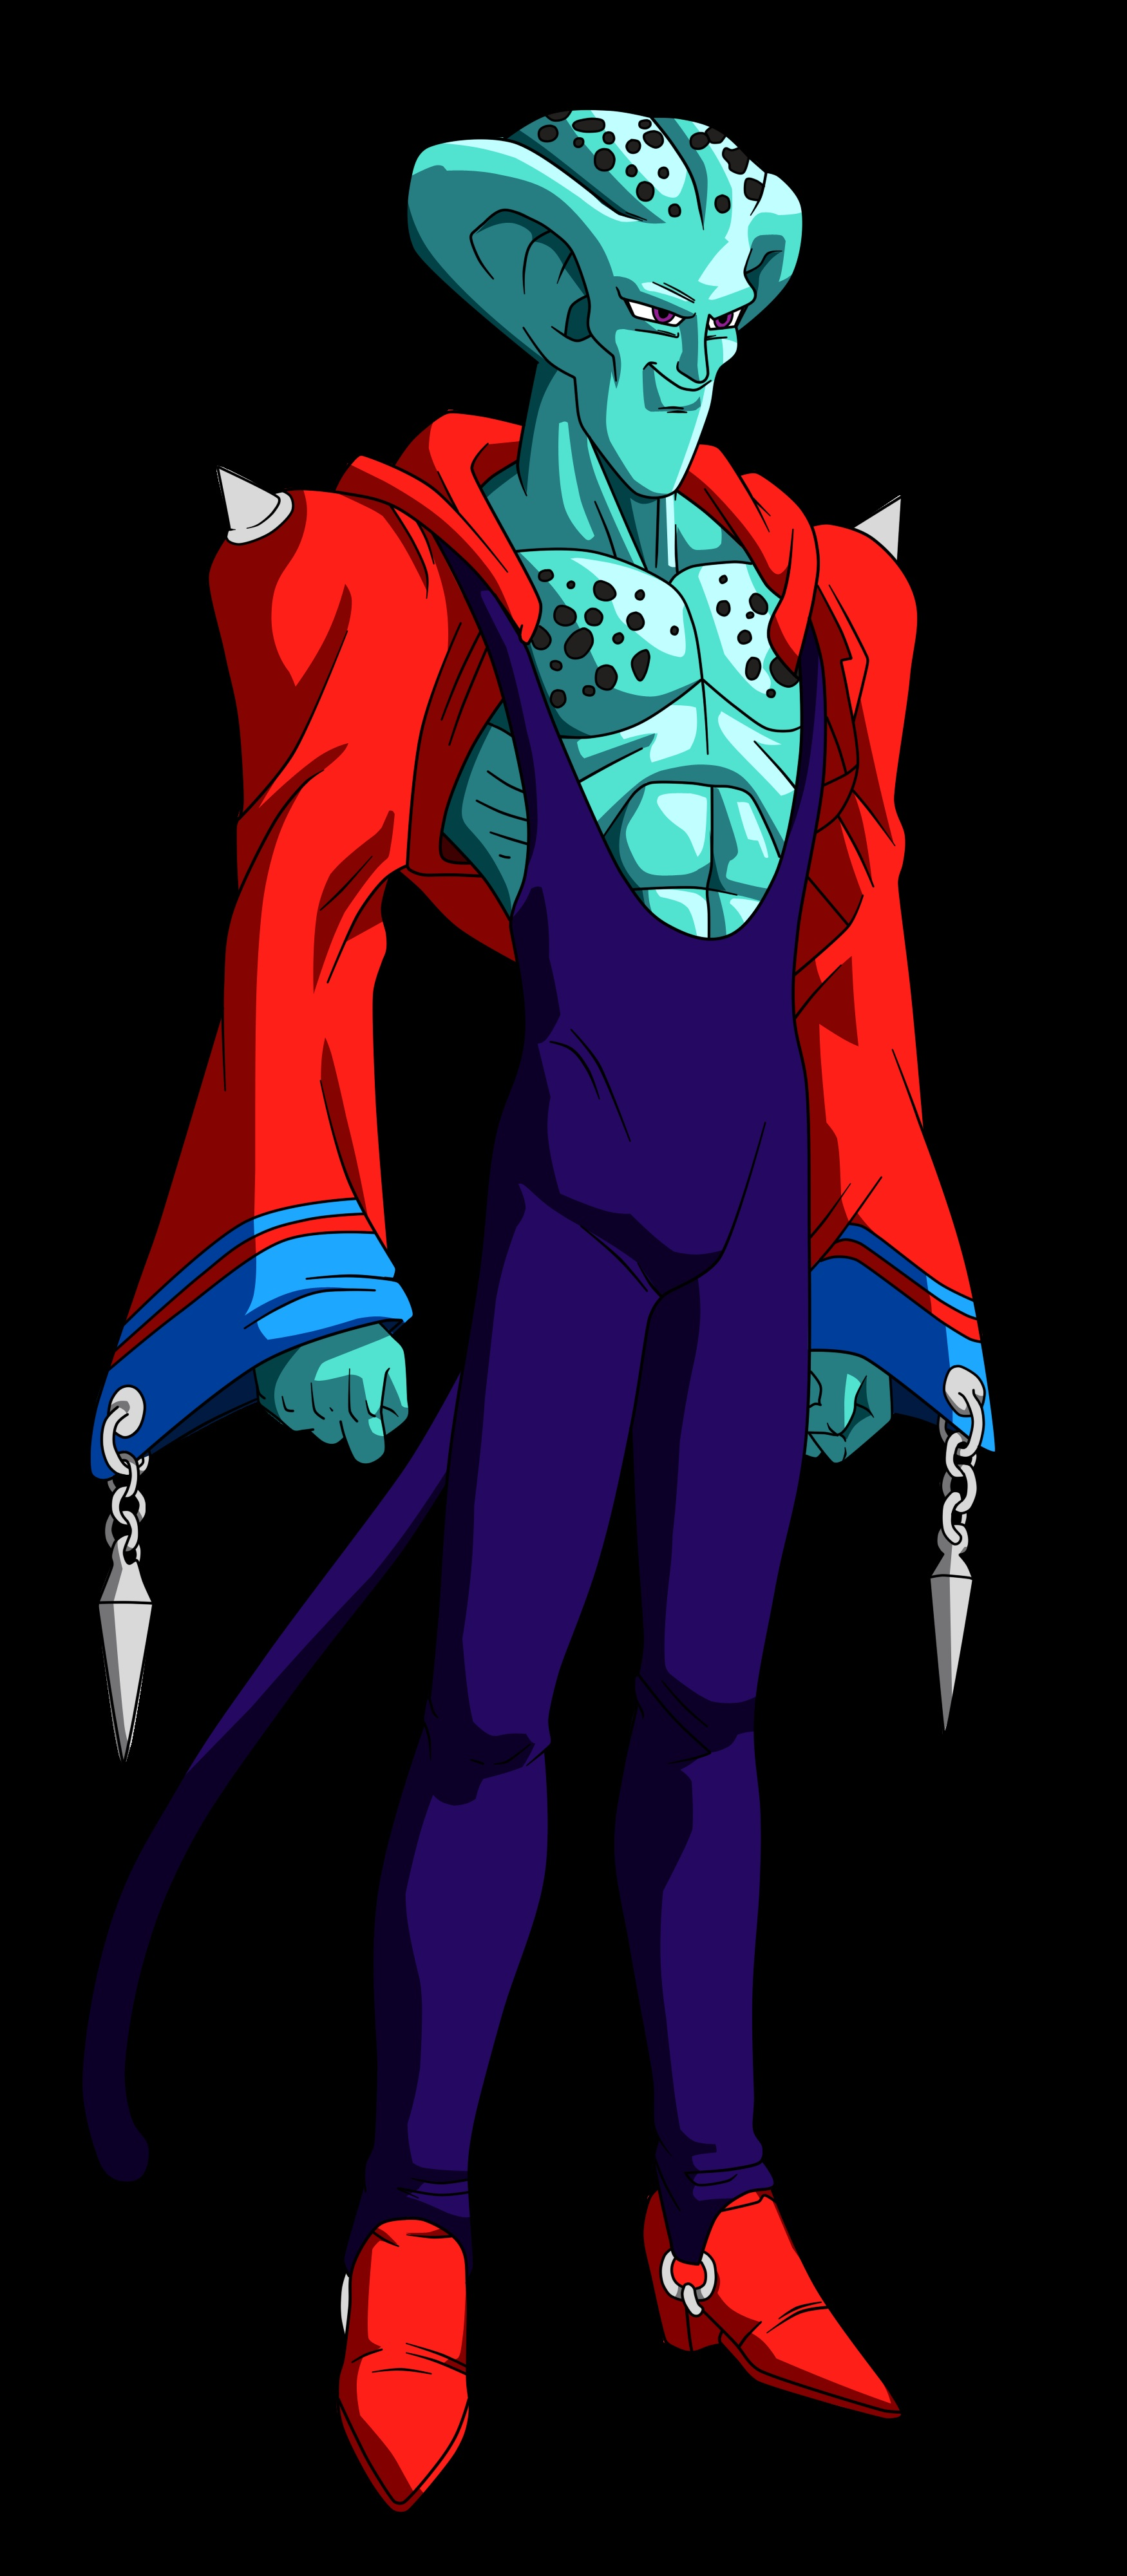 Ledgic - Villains Wiki - villains, bad guys, comic books, anime